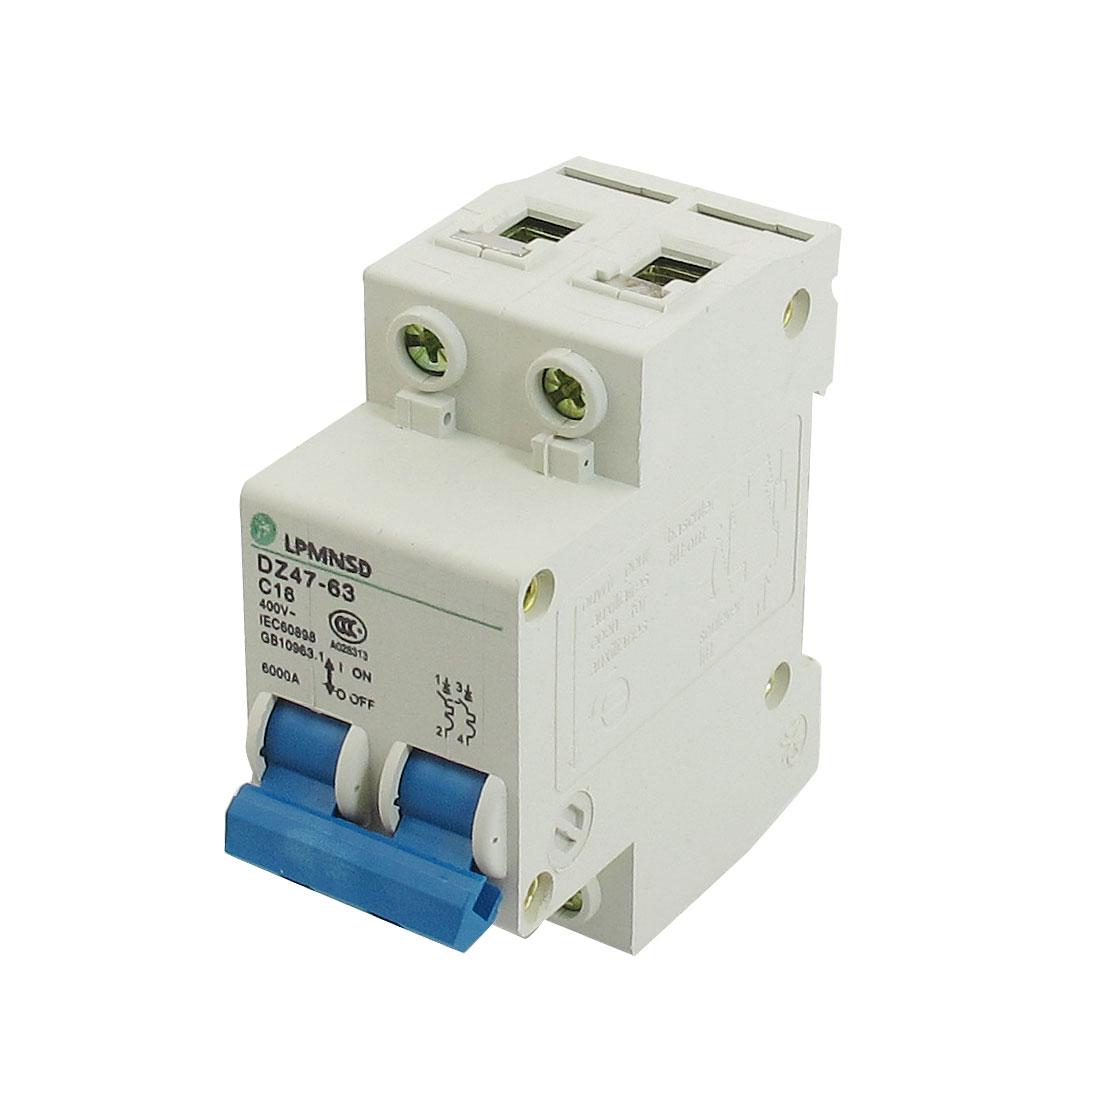 DZ47-63 C16 16A 400VAC 6000A Breaking Capacity 2 Poles Circuit Breaker